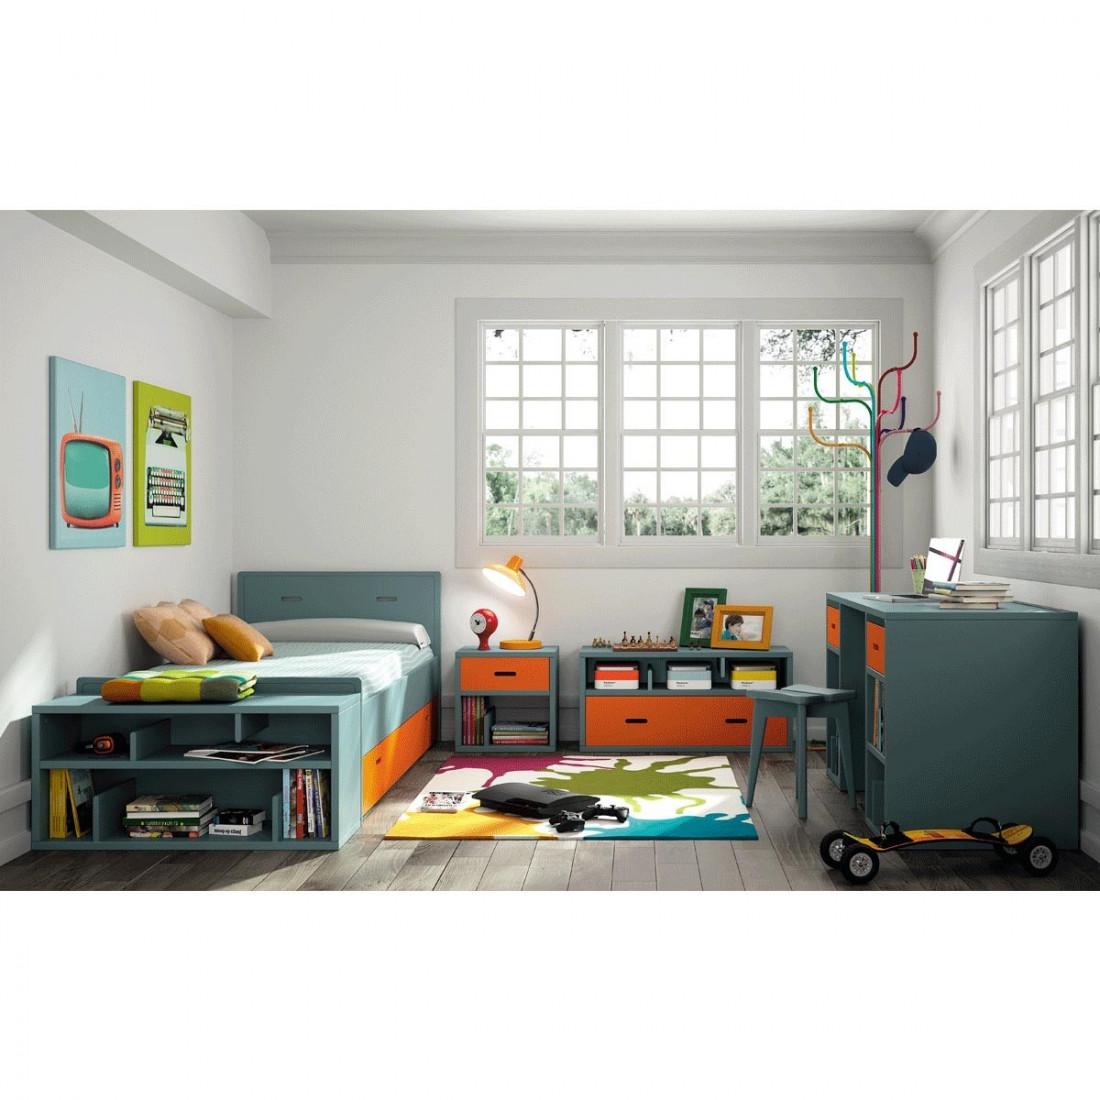 coffre de rangement enfant madaket mathy by bols ma chambramoi. Black Bedroom Furniture Sets. Home Design Ideas